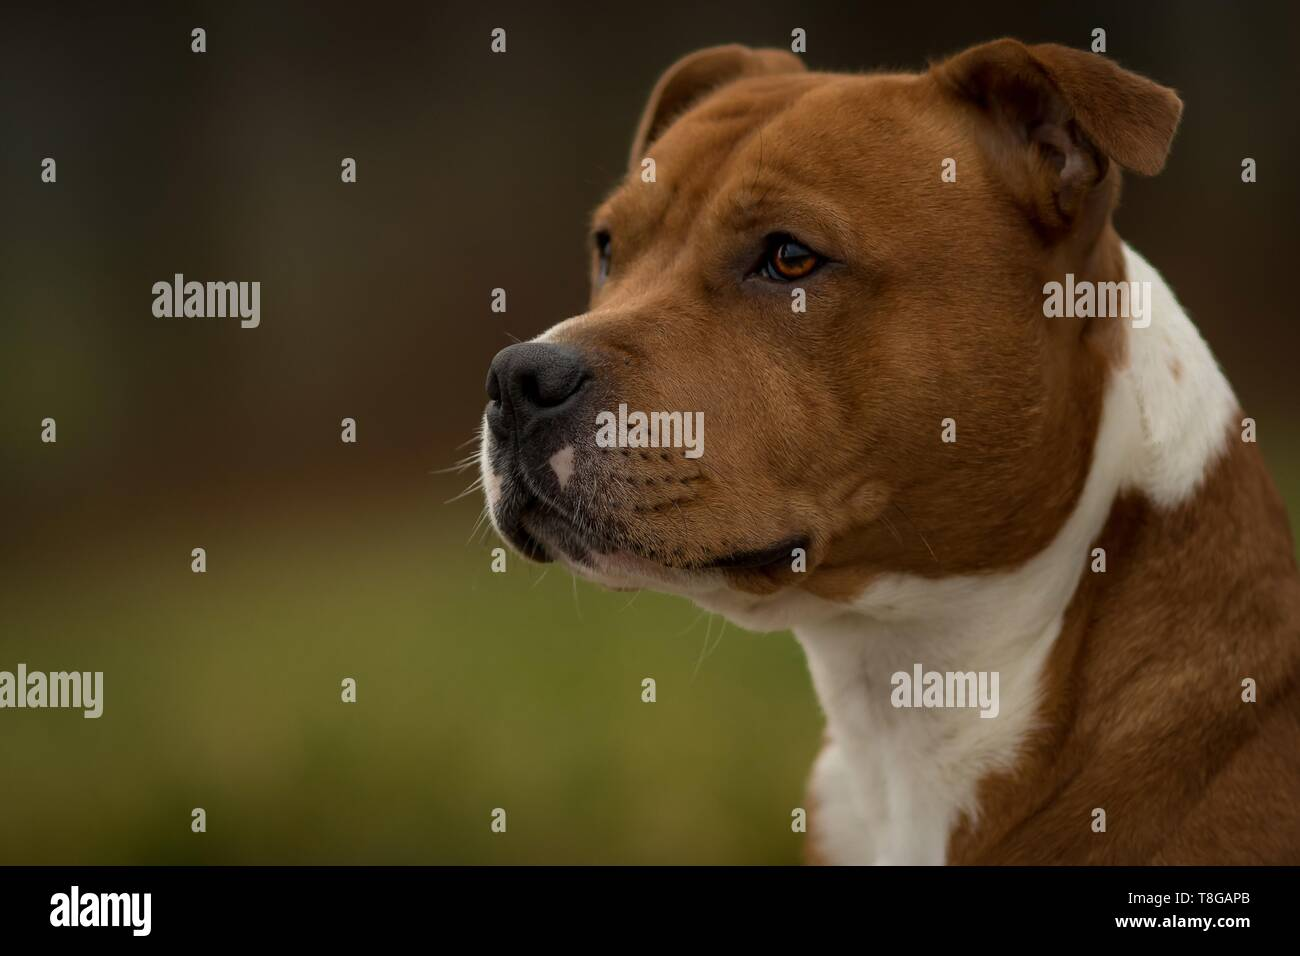 Staffordshire Bullterrier Portrait - Stock Image